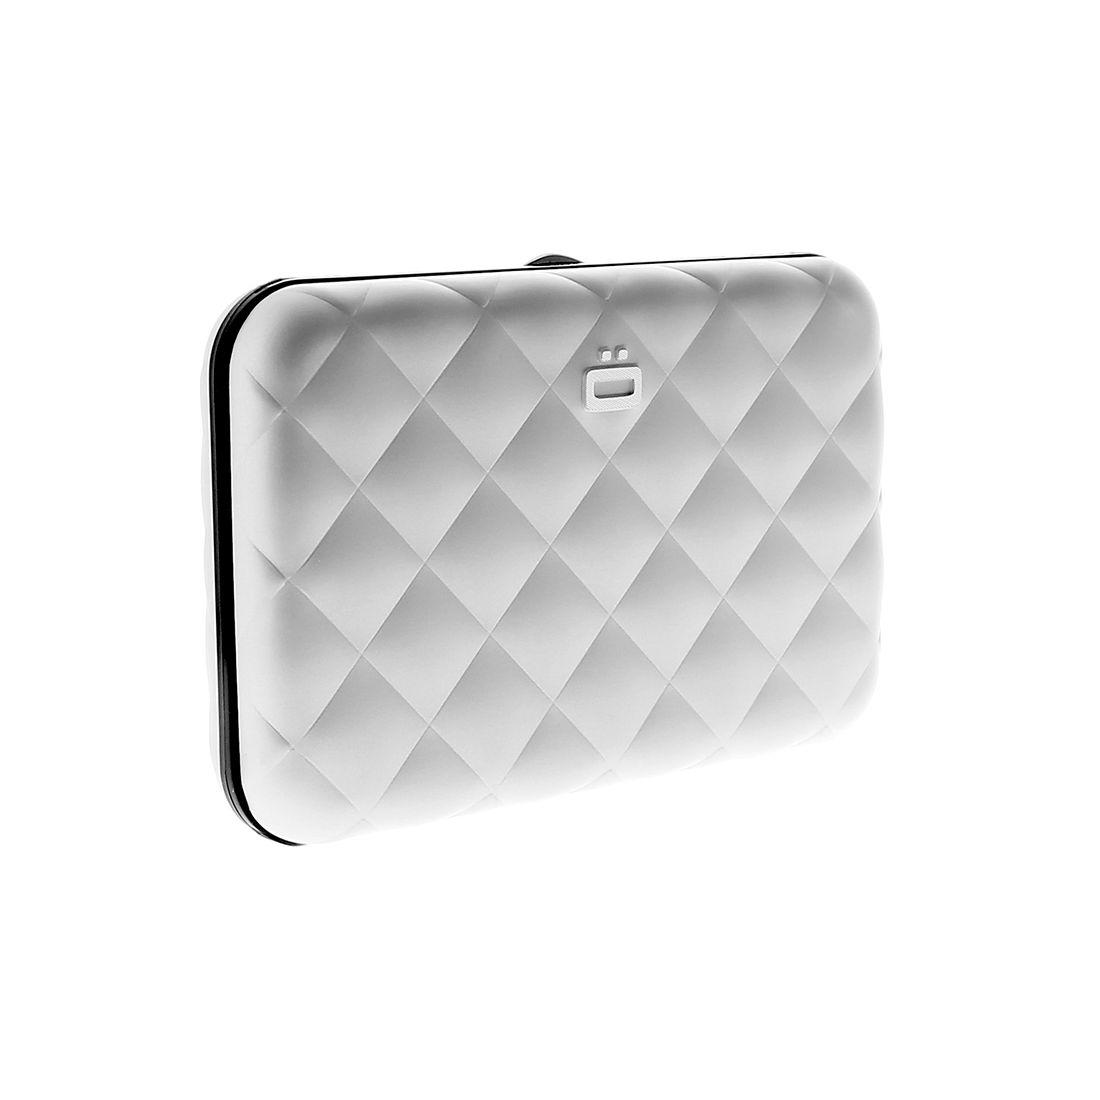 Porte carte aluminium silver quilted button ogon designs ogon des - Porte carte aluminium ogon ...